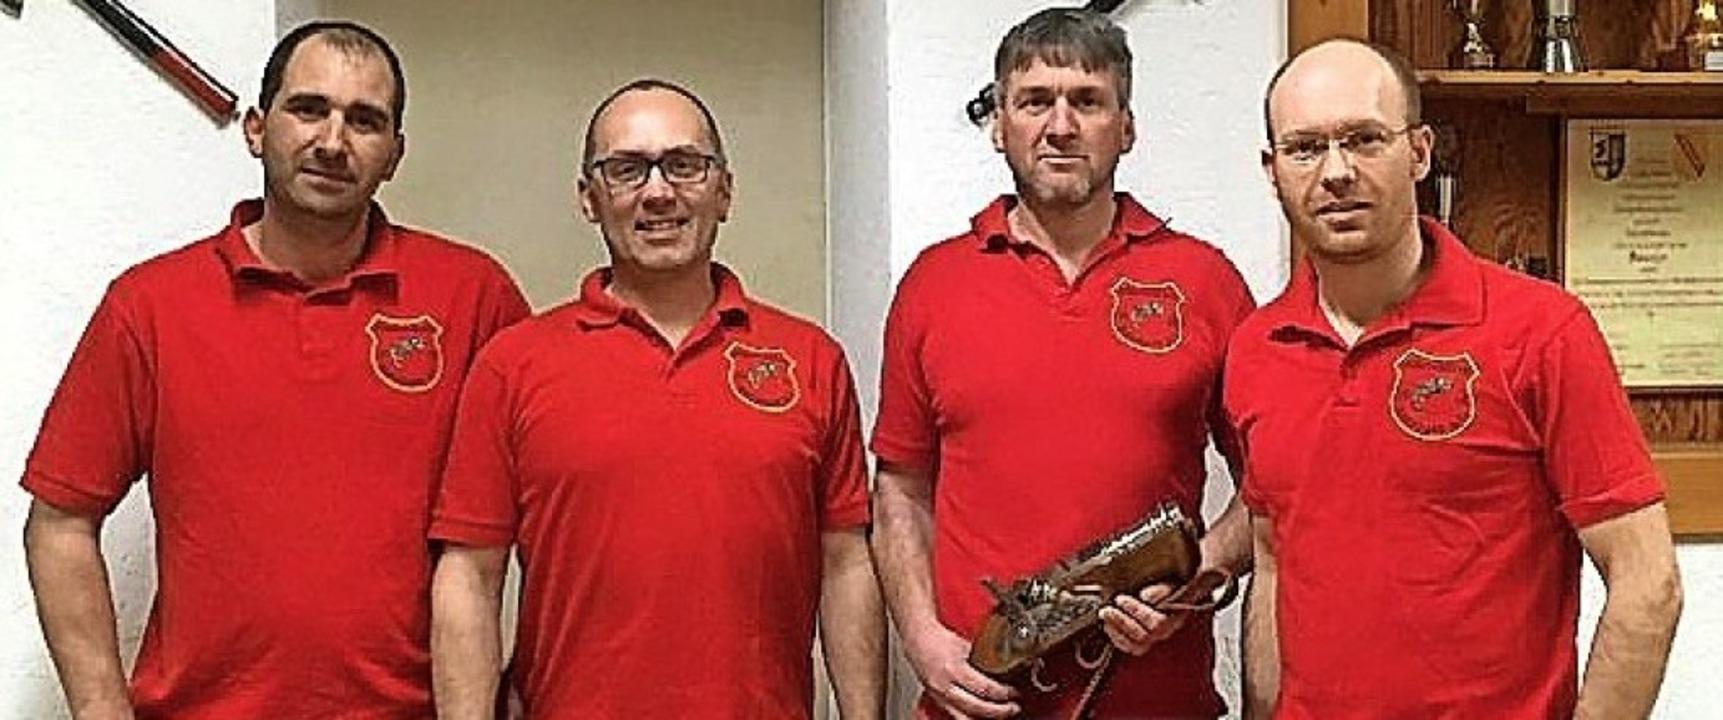 Hansjürgen Weiß, Peter Geugelin, Marku...ren zum  Vorstand der Böllerschützen.     Foto: privat